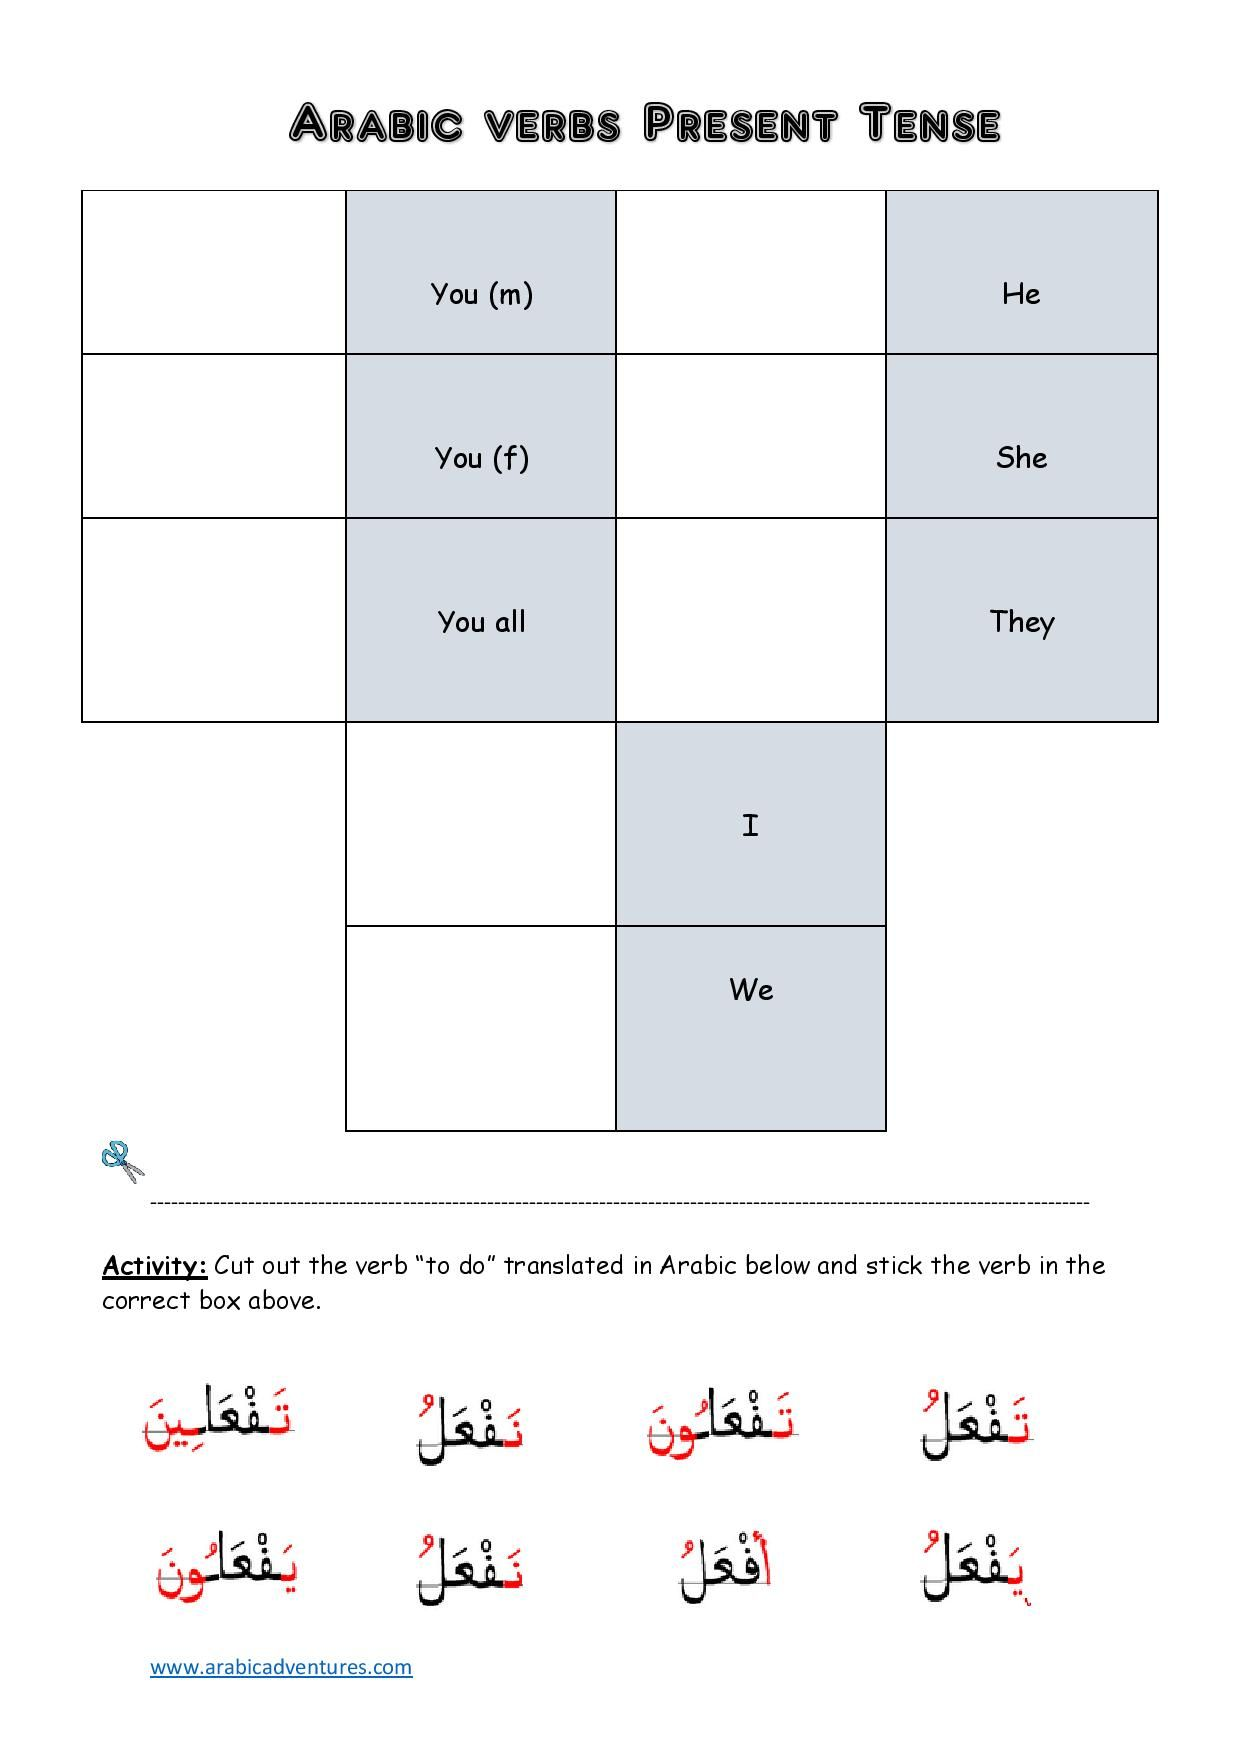 Arabic present tense activity